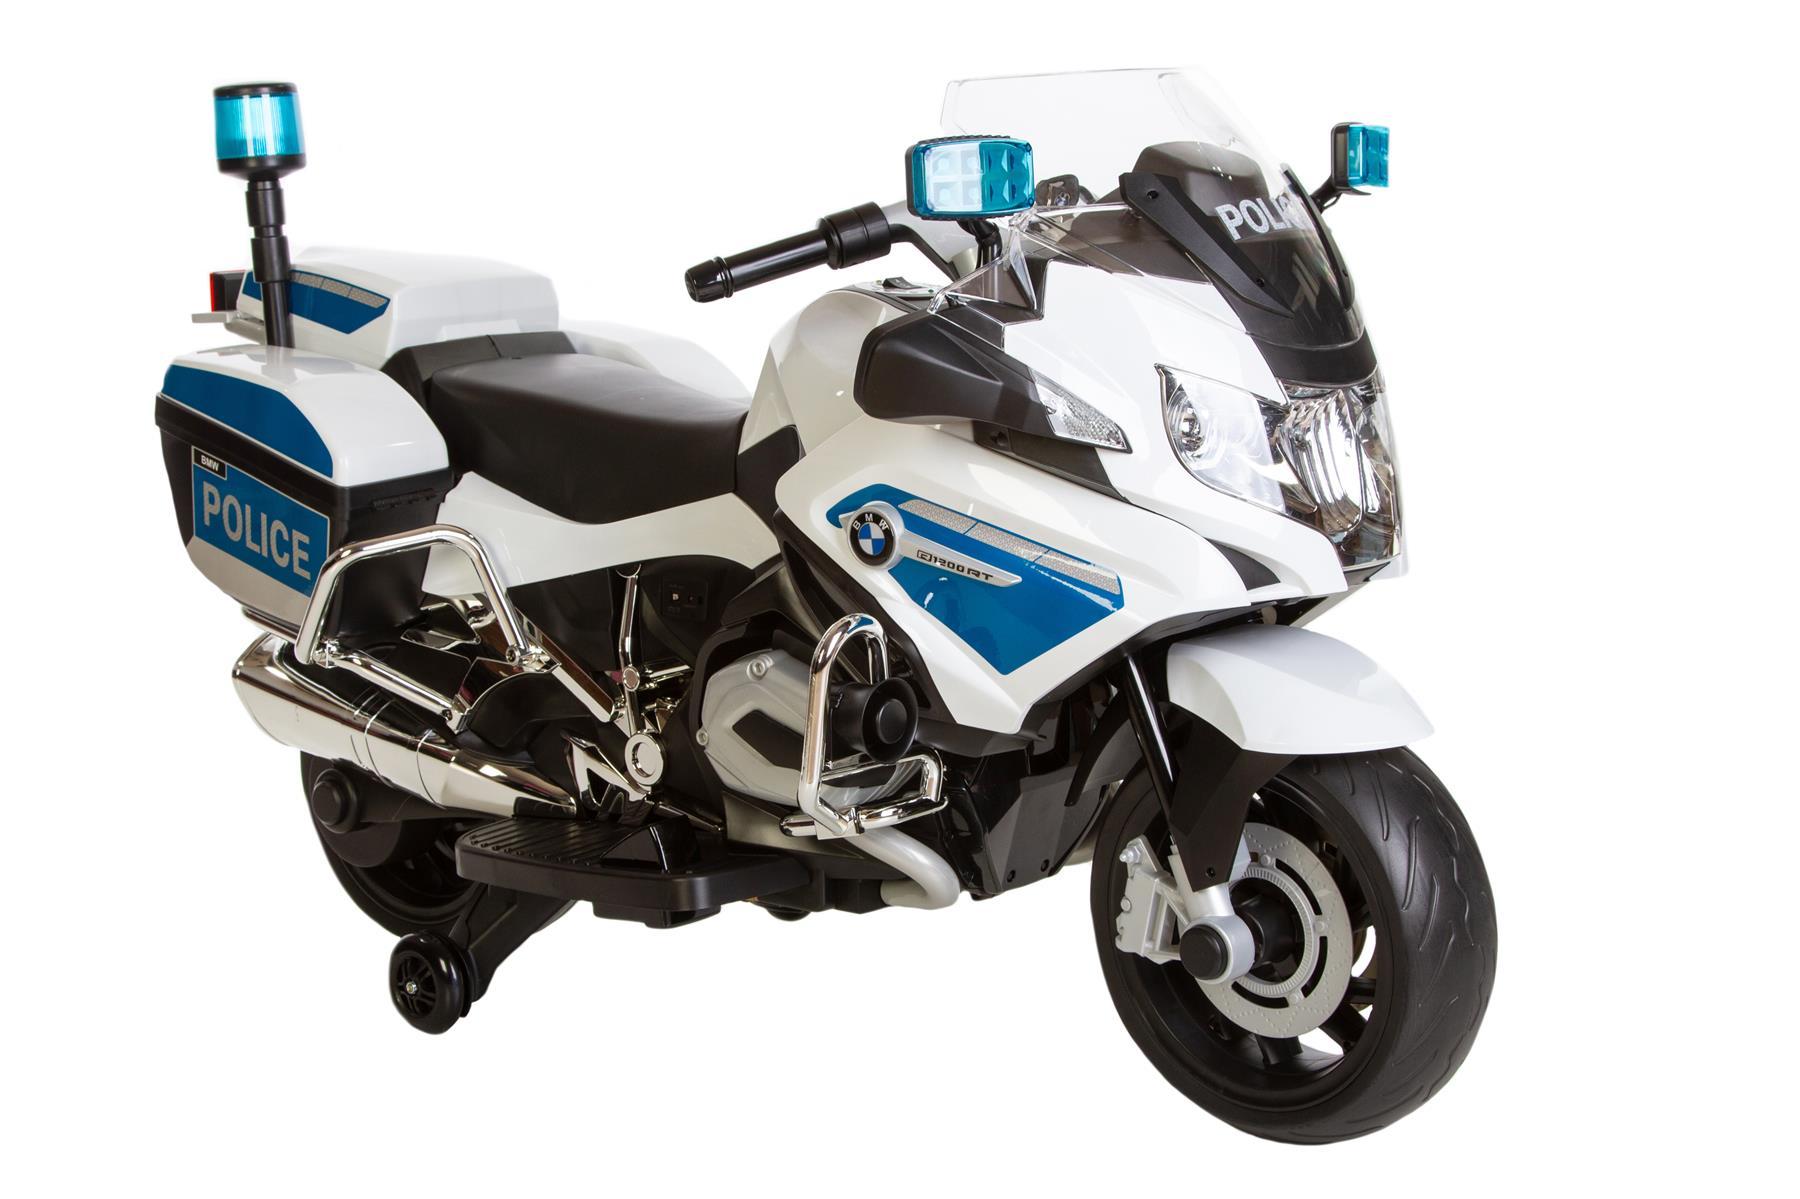 BMW R1200 Police motorcykel 12V - BMW R1200 Police motorcykel 12V